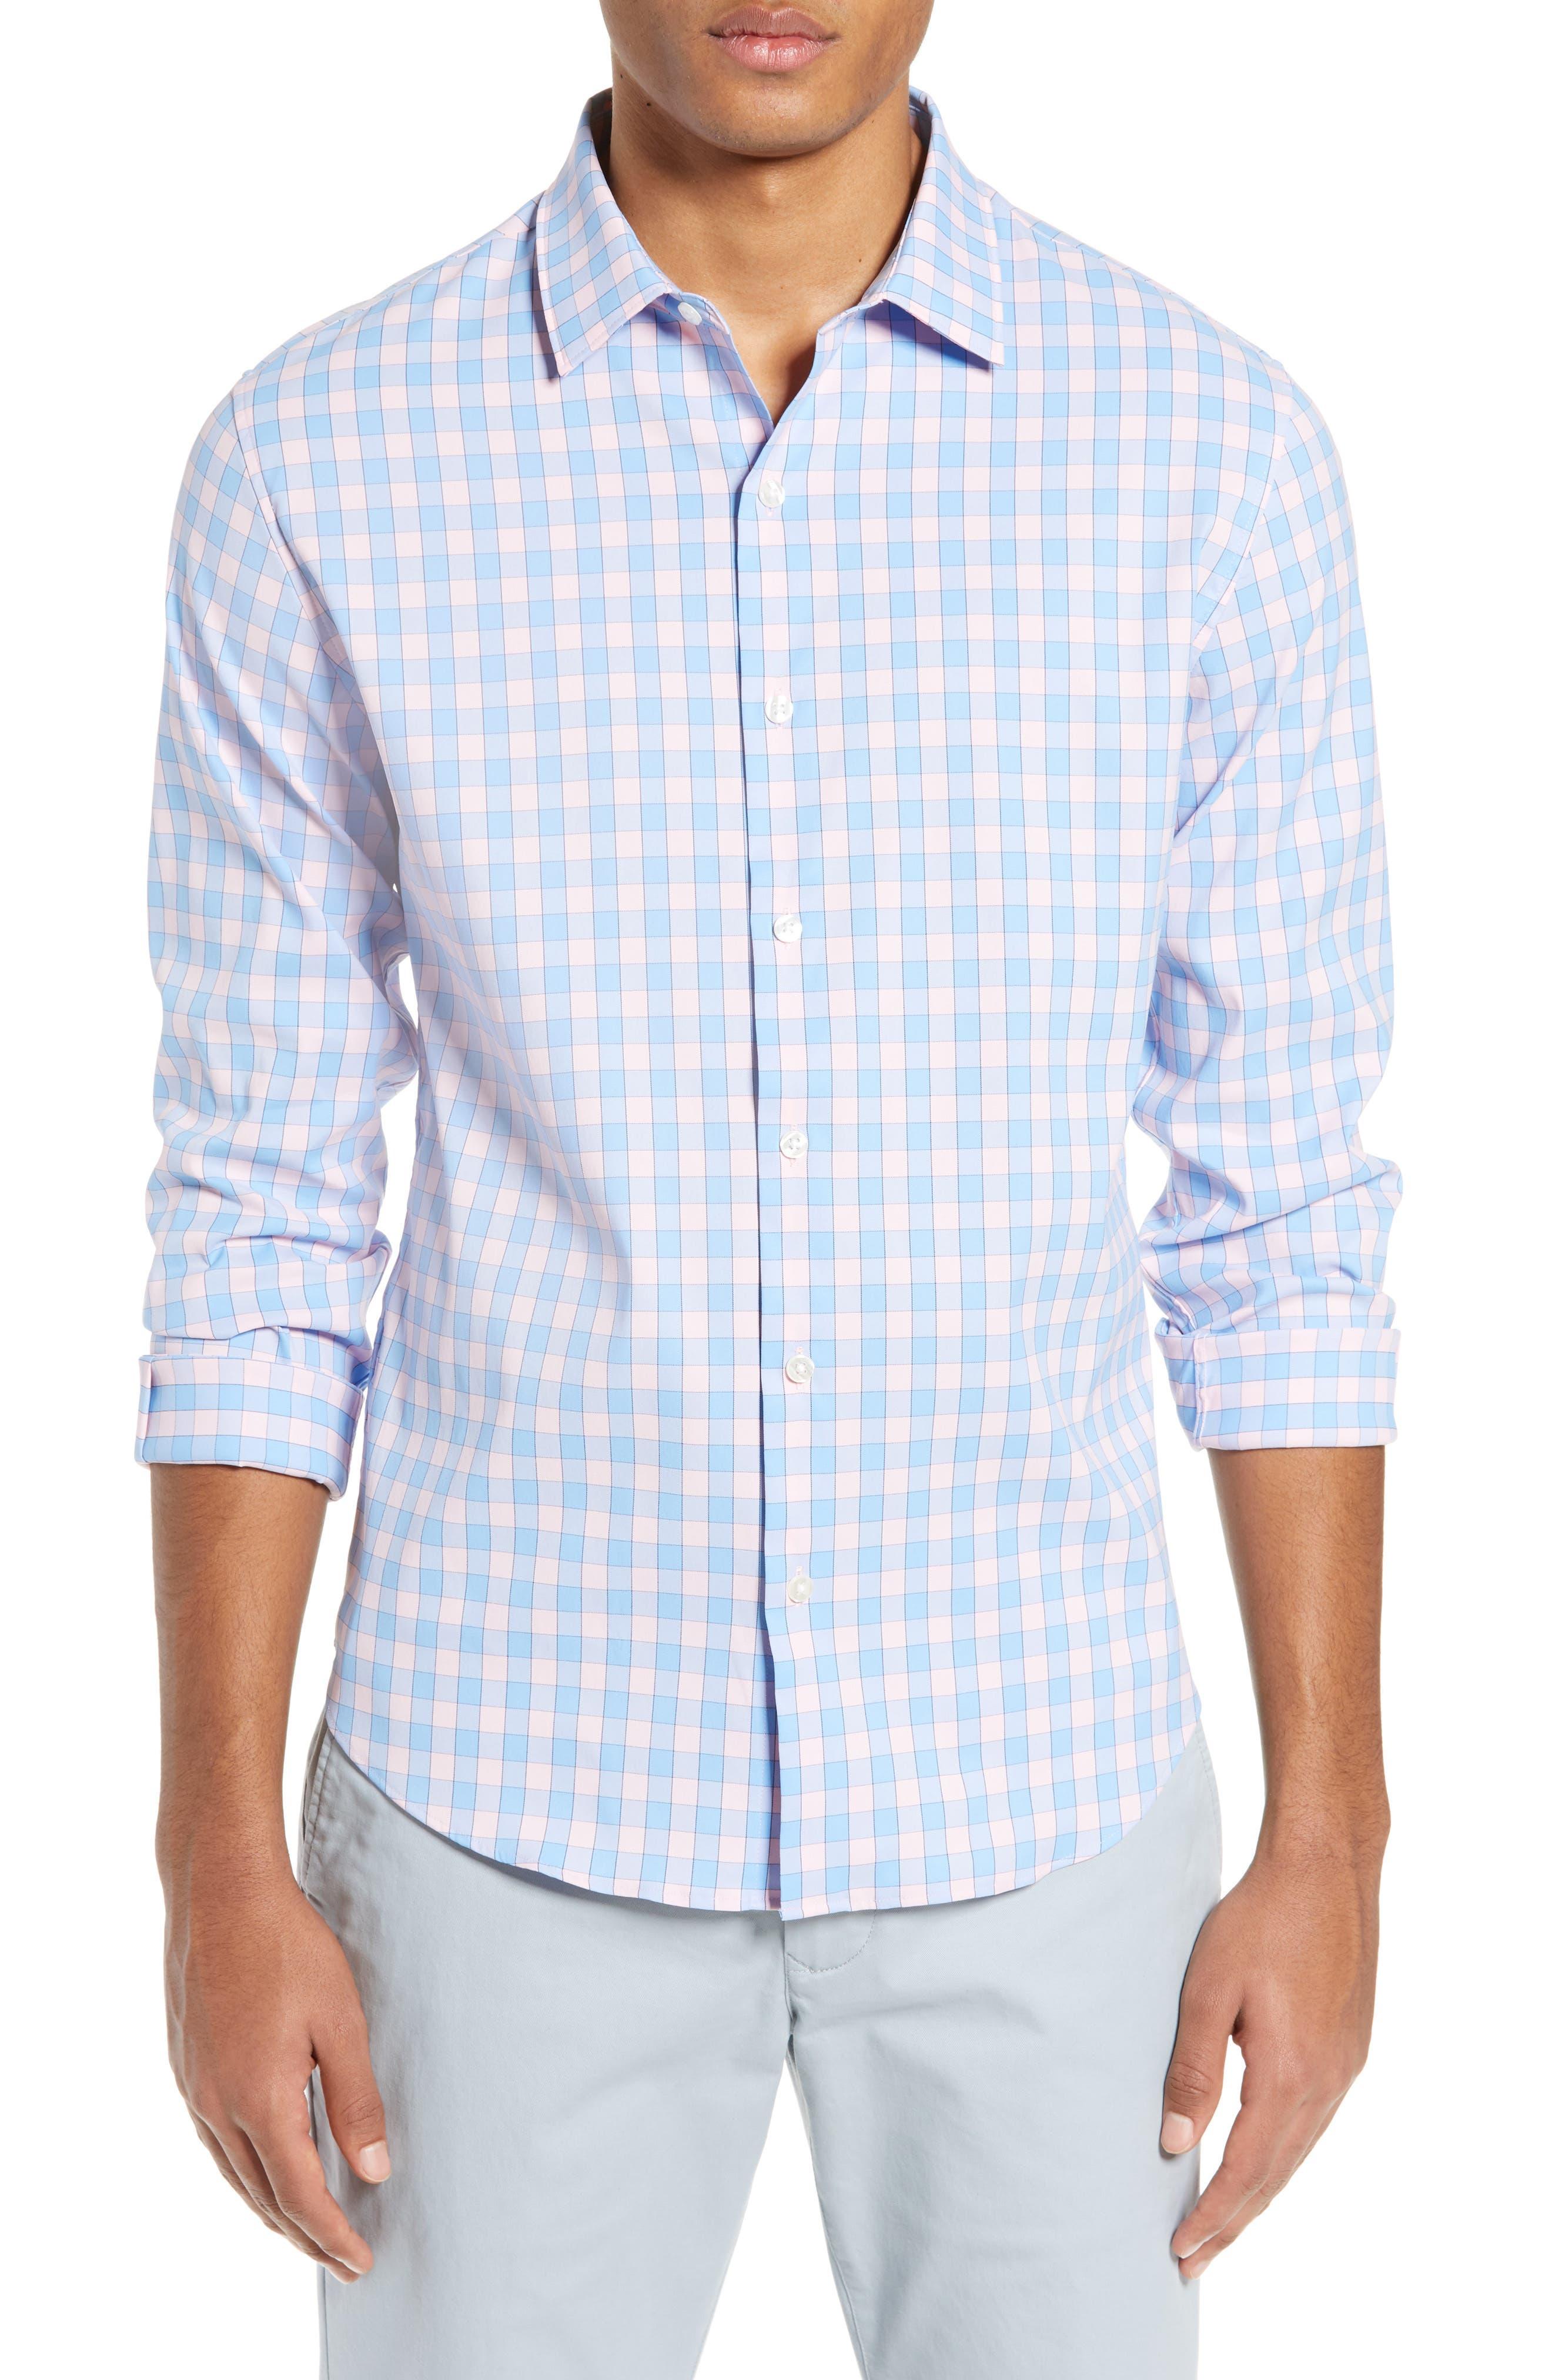 BONOBOS Slim Fit Check Tech Sport Shirt, Main, color, SAIL BOAT FIRST BLUSH